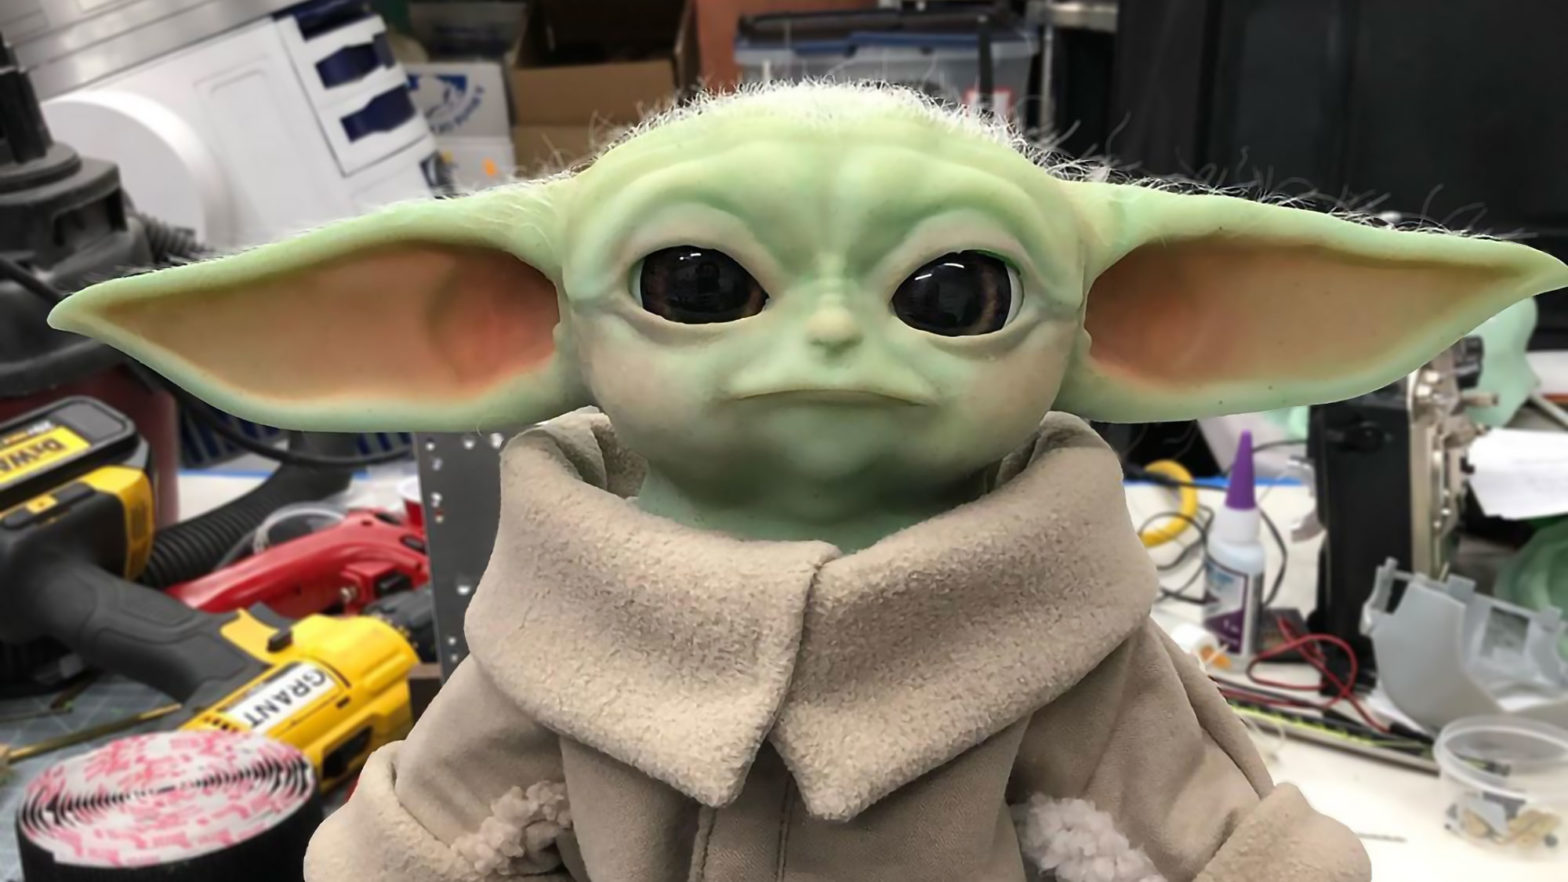 Animatronic Baby Yoda Grant Imahara